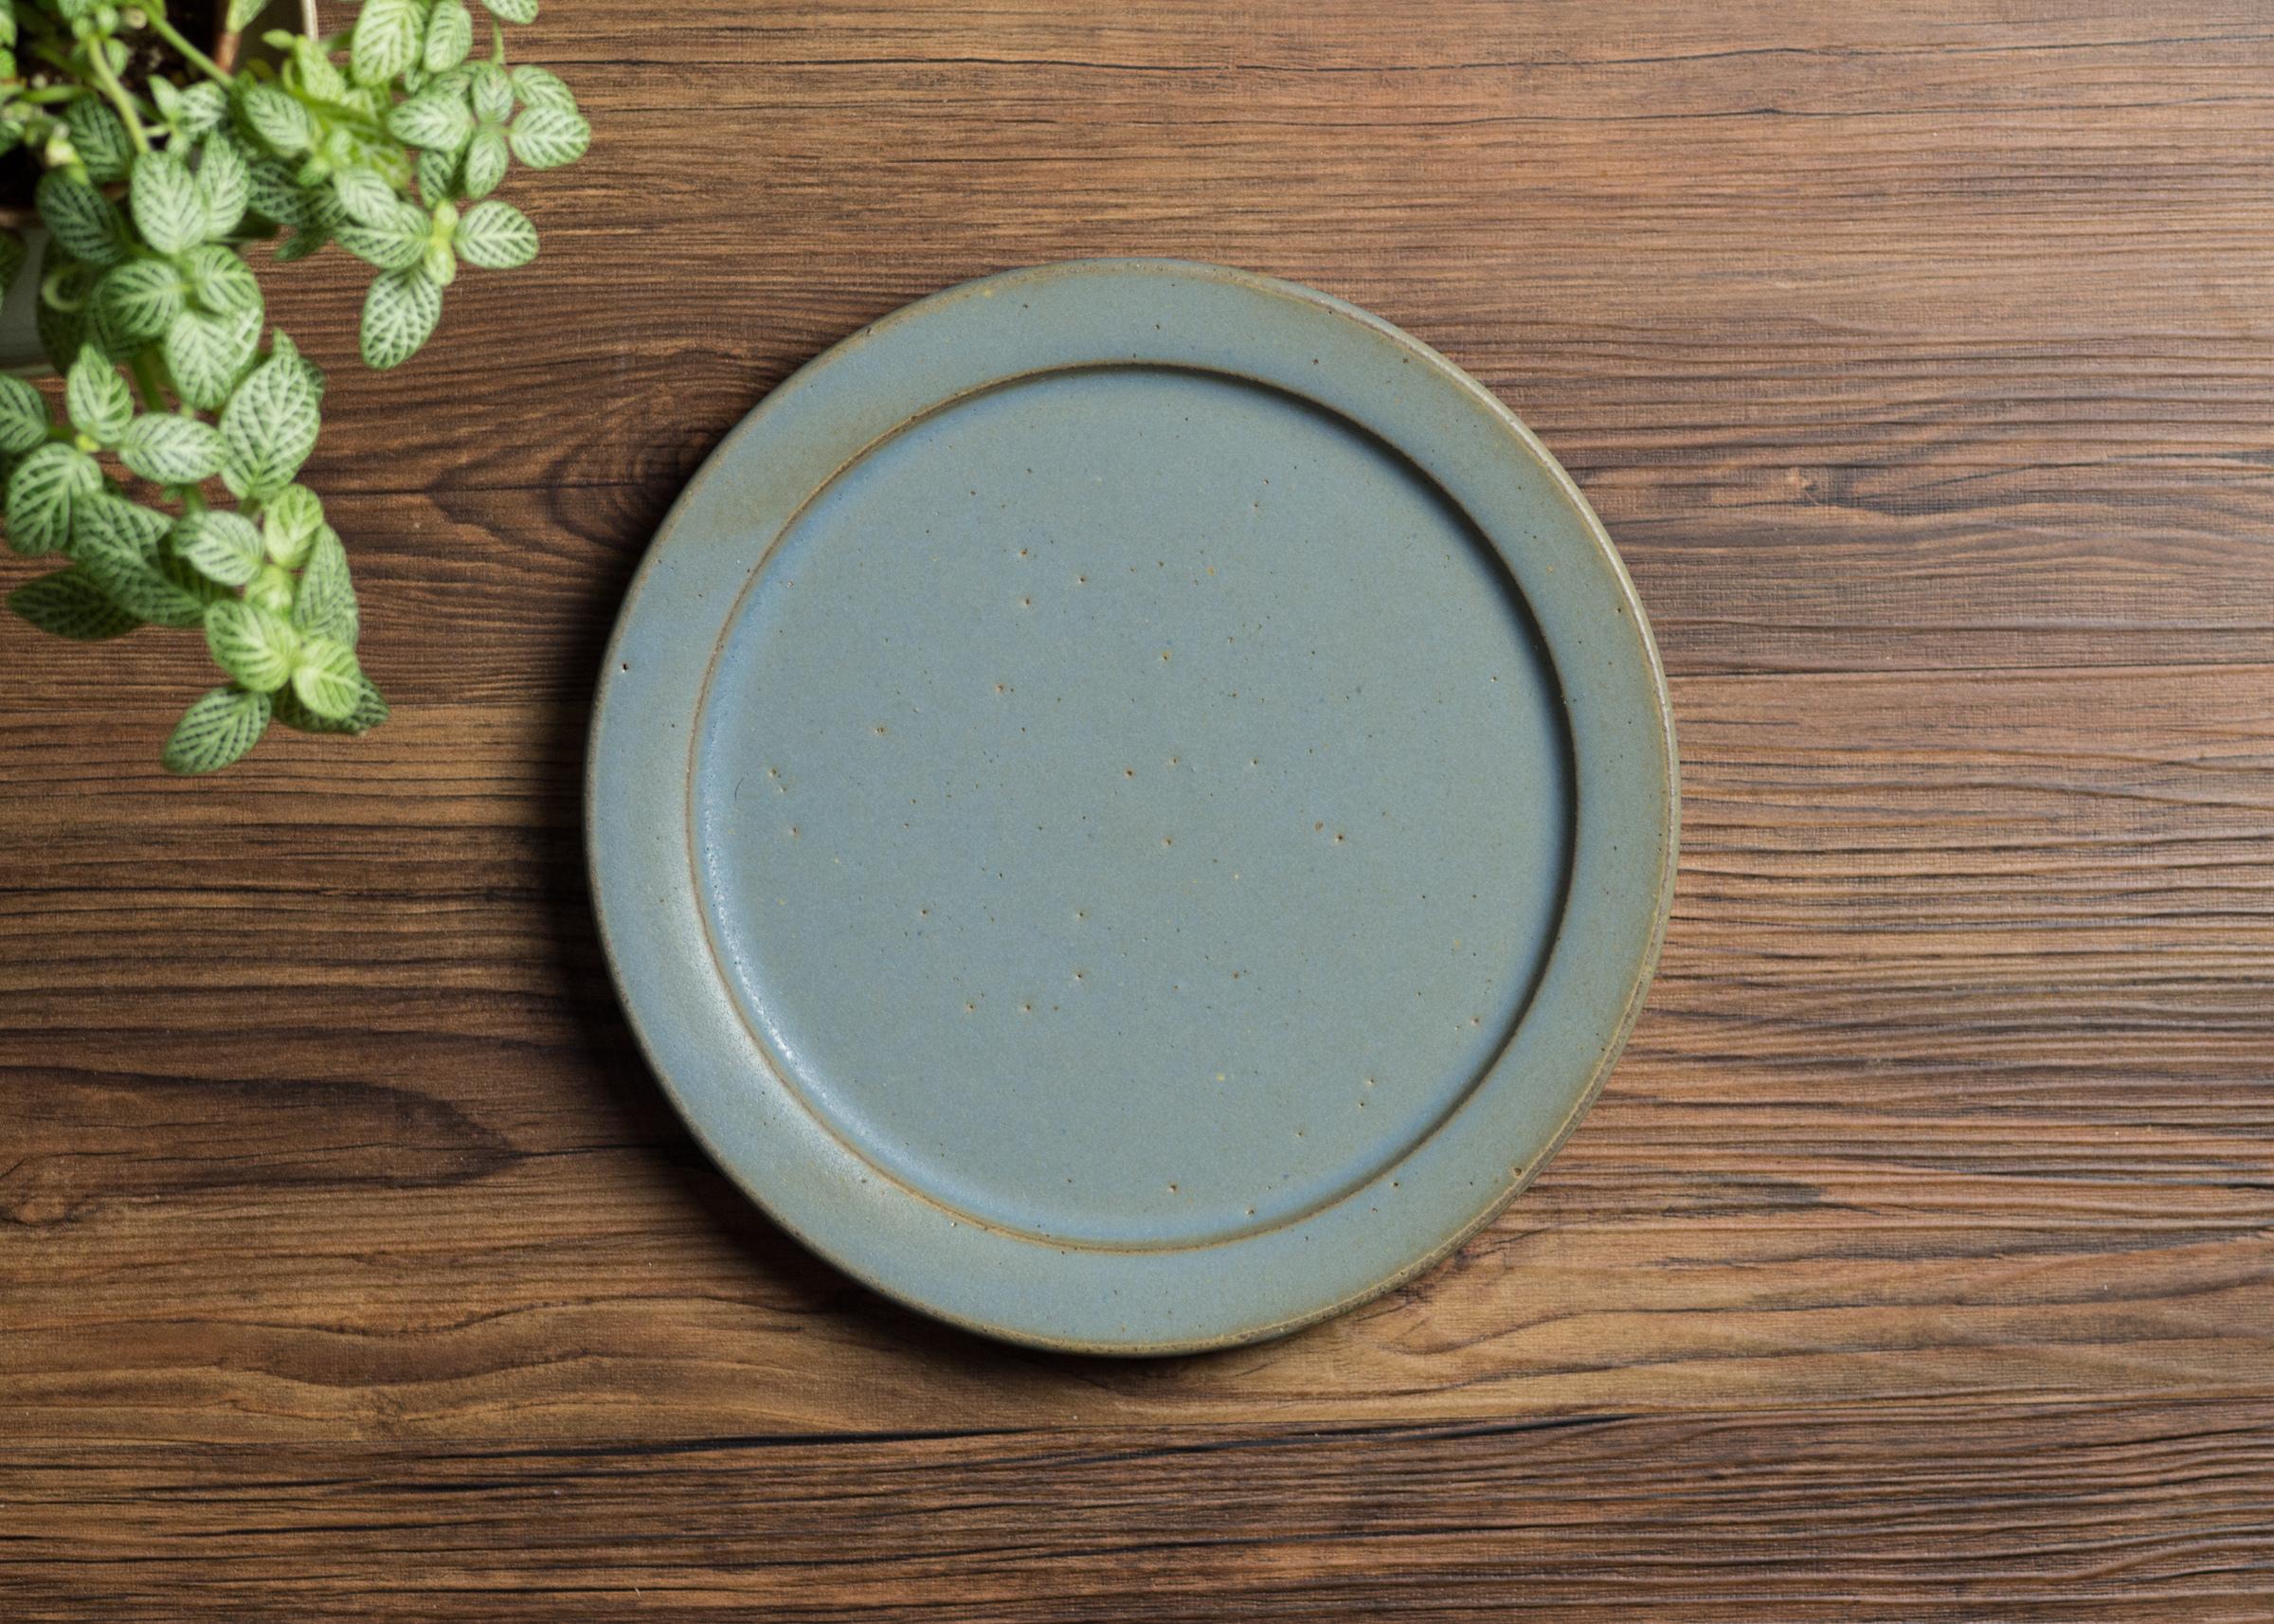 SHIROUMA 洋皿 21cm 灰色(中皿・リムプレート・メインディッシュ)/長谷川 哲也